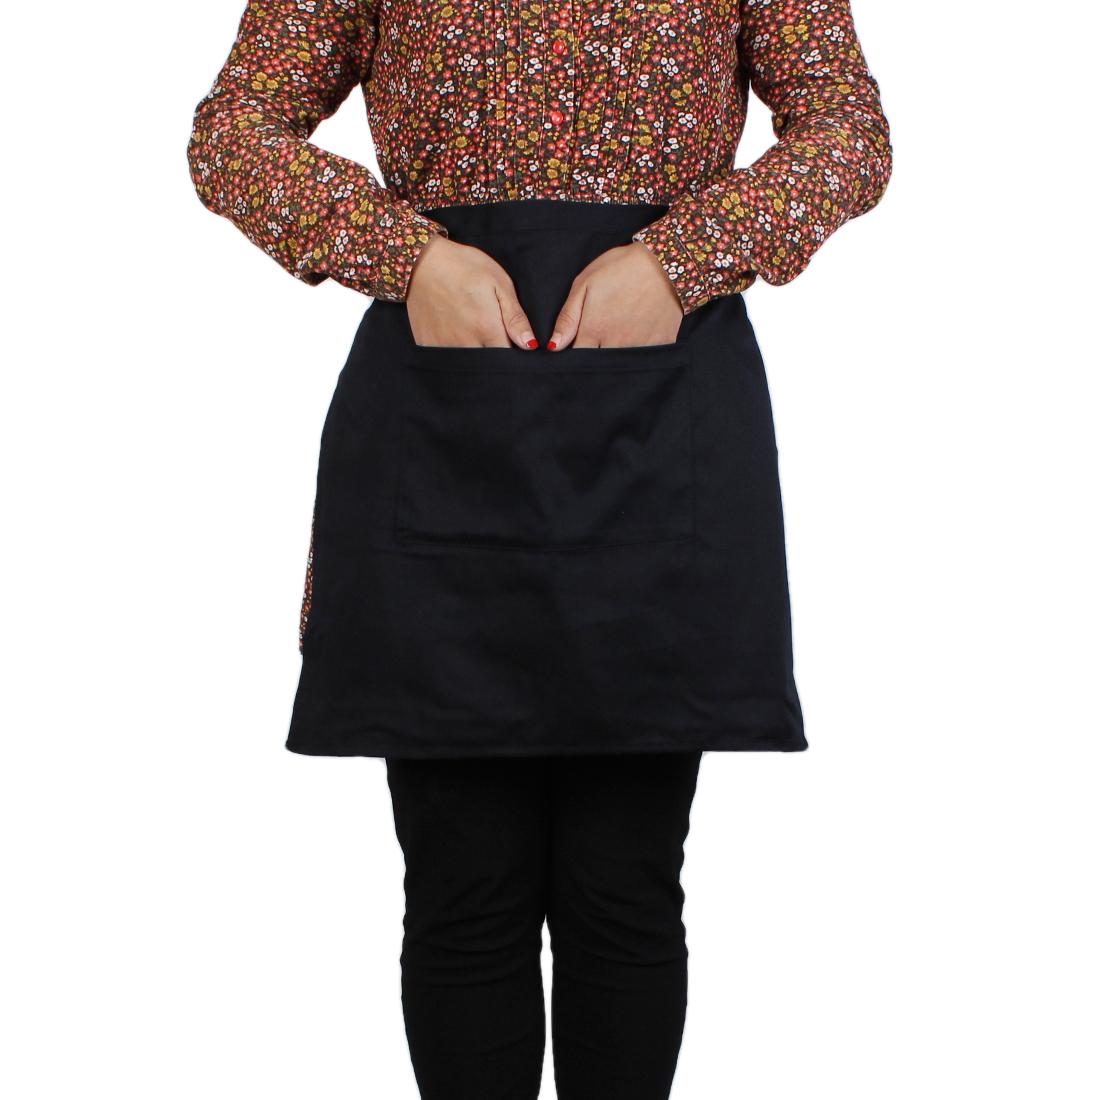 Woman Hot Pot Kitchen Cooking Fabric Halter NeckPocket Apron Bib Black